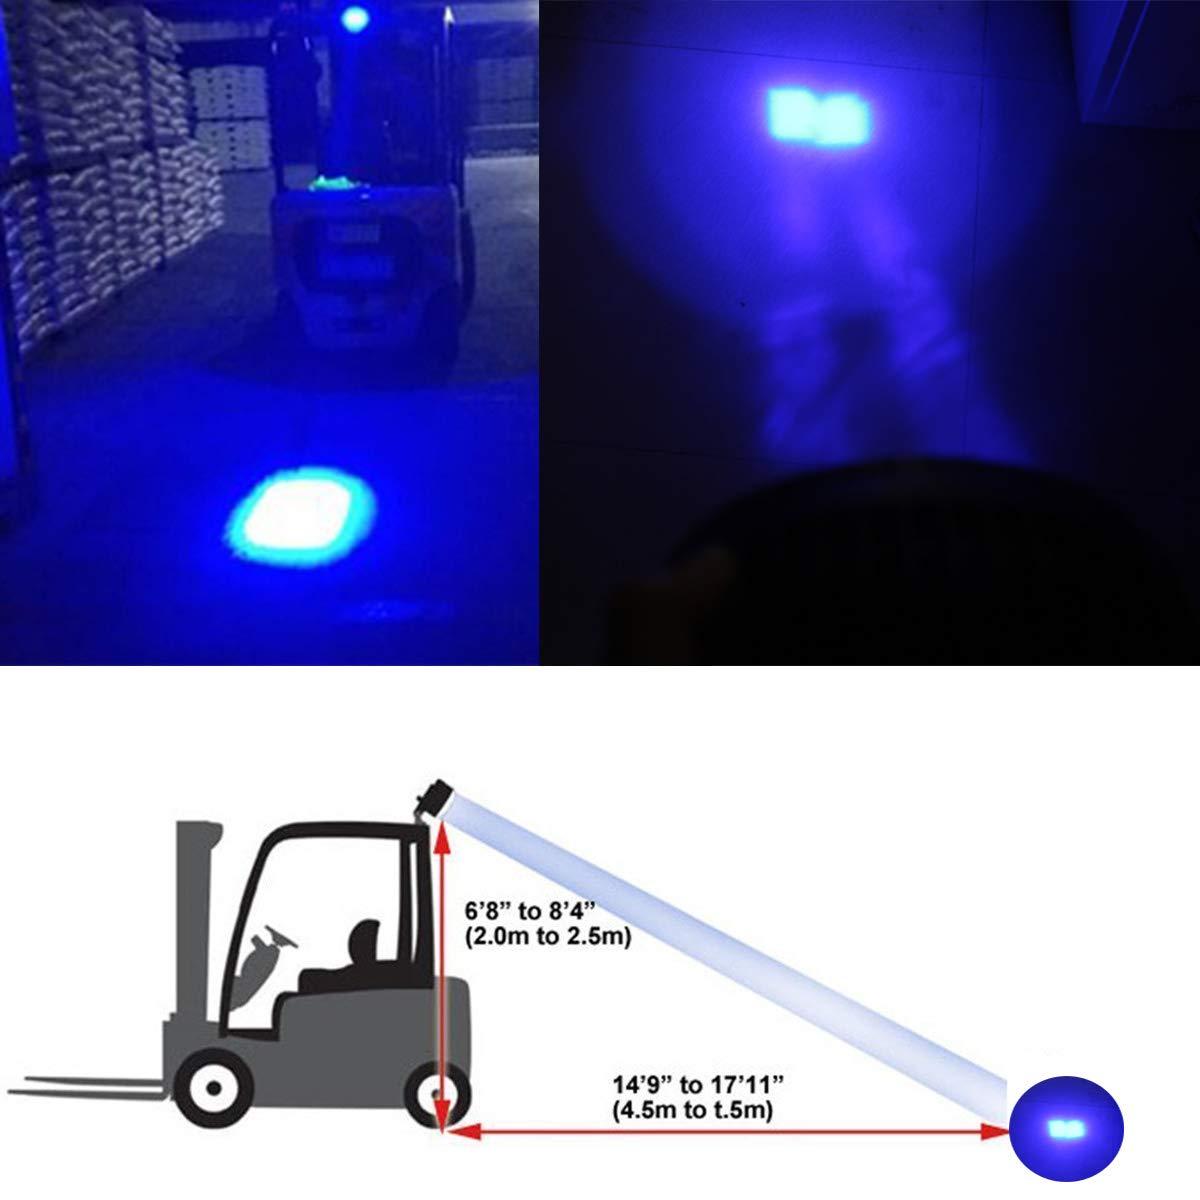 LY8 LED Forklift Safety Light Red Zone Light Warehouse Pedestrian Safe Warning Light 8W 10V-80V DC